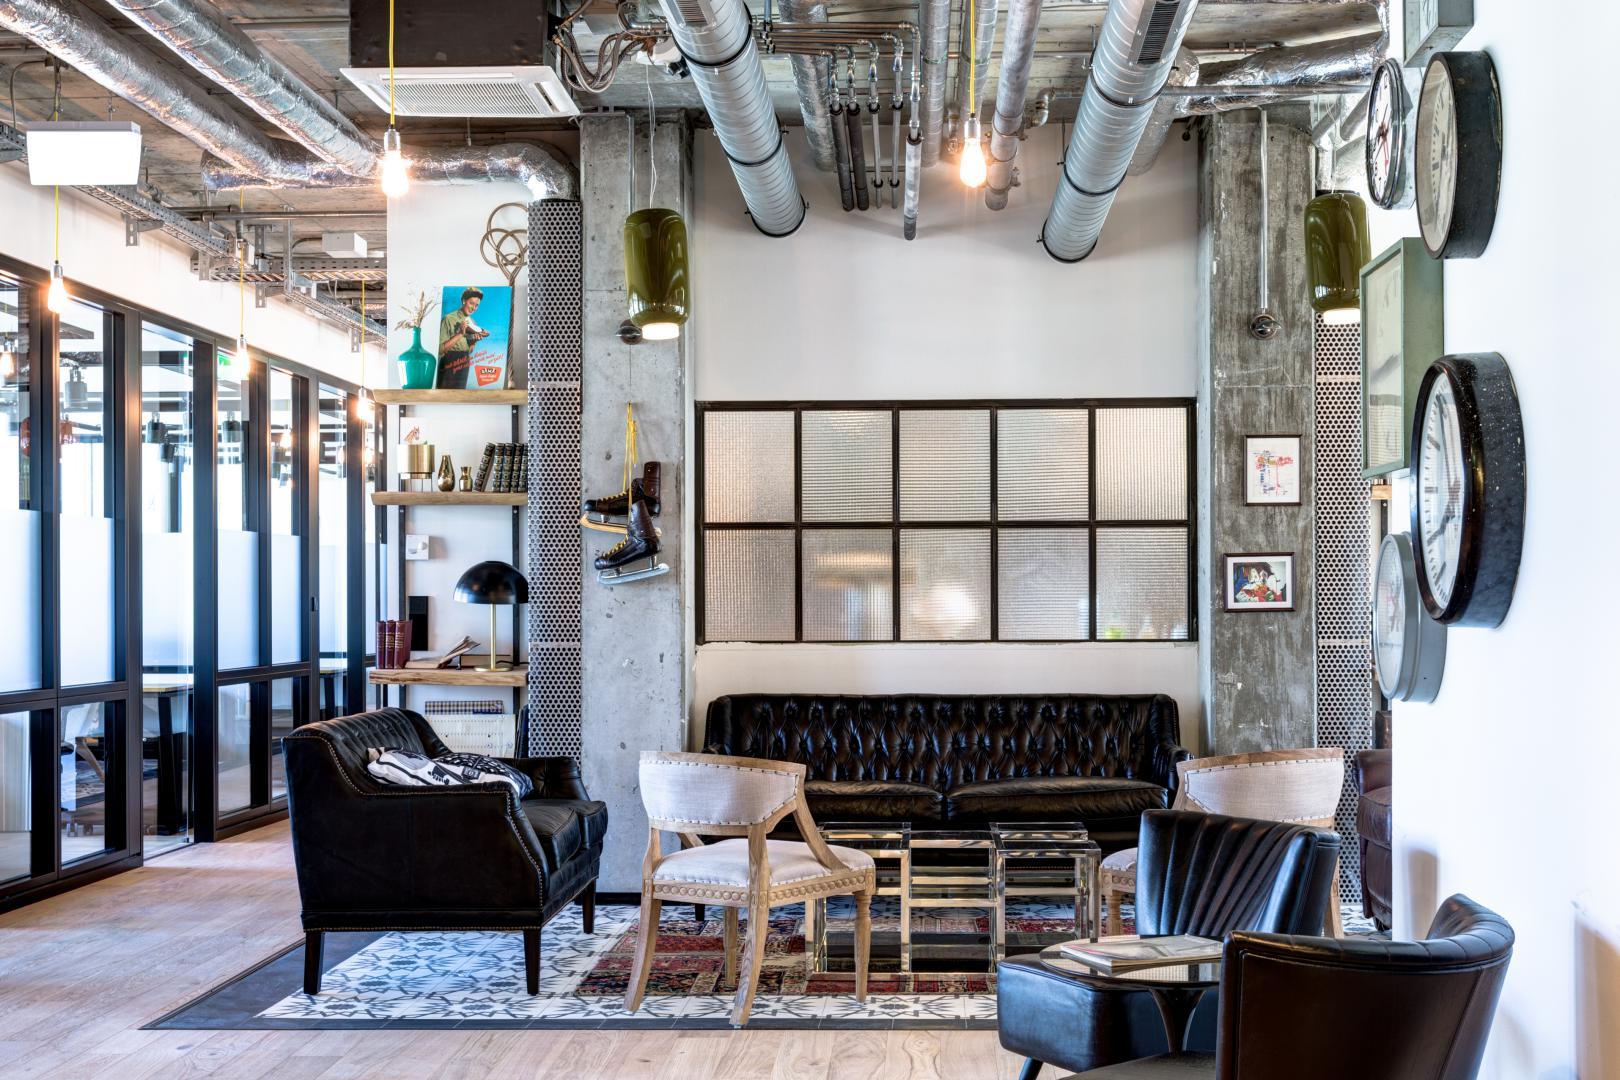 b ro mieten in hamburg r dingsmarkt 9 teamsuite. Black Bedroom Furniture Sets. Home Design Ideas